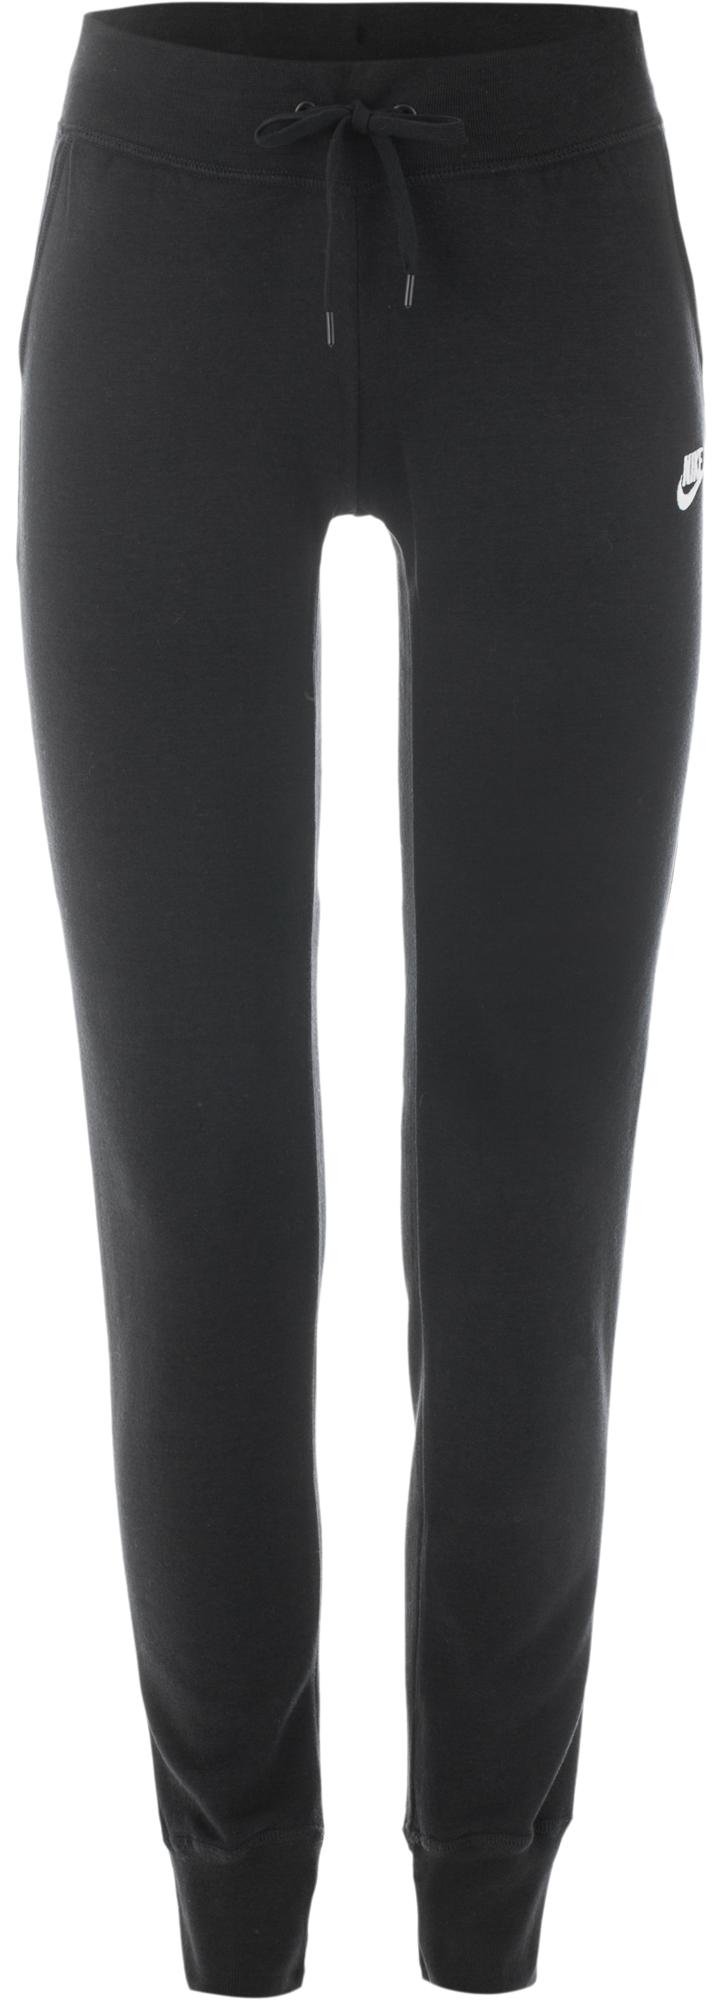 Nike Брюки женские Nike Sportswear, размер 48-50 nike бриджи женские nike sportswear vintage размер 48 50